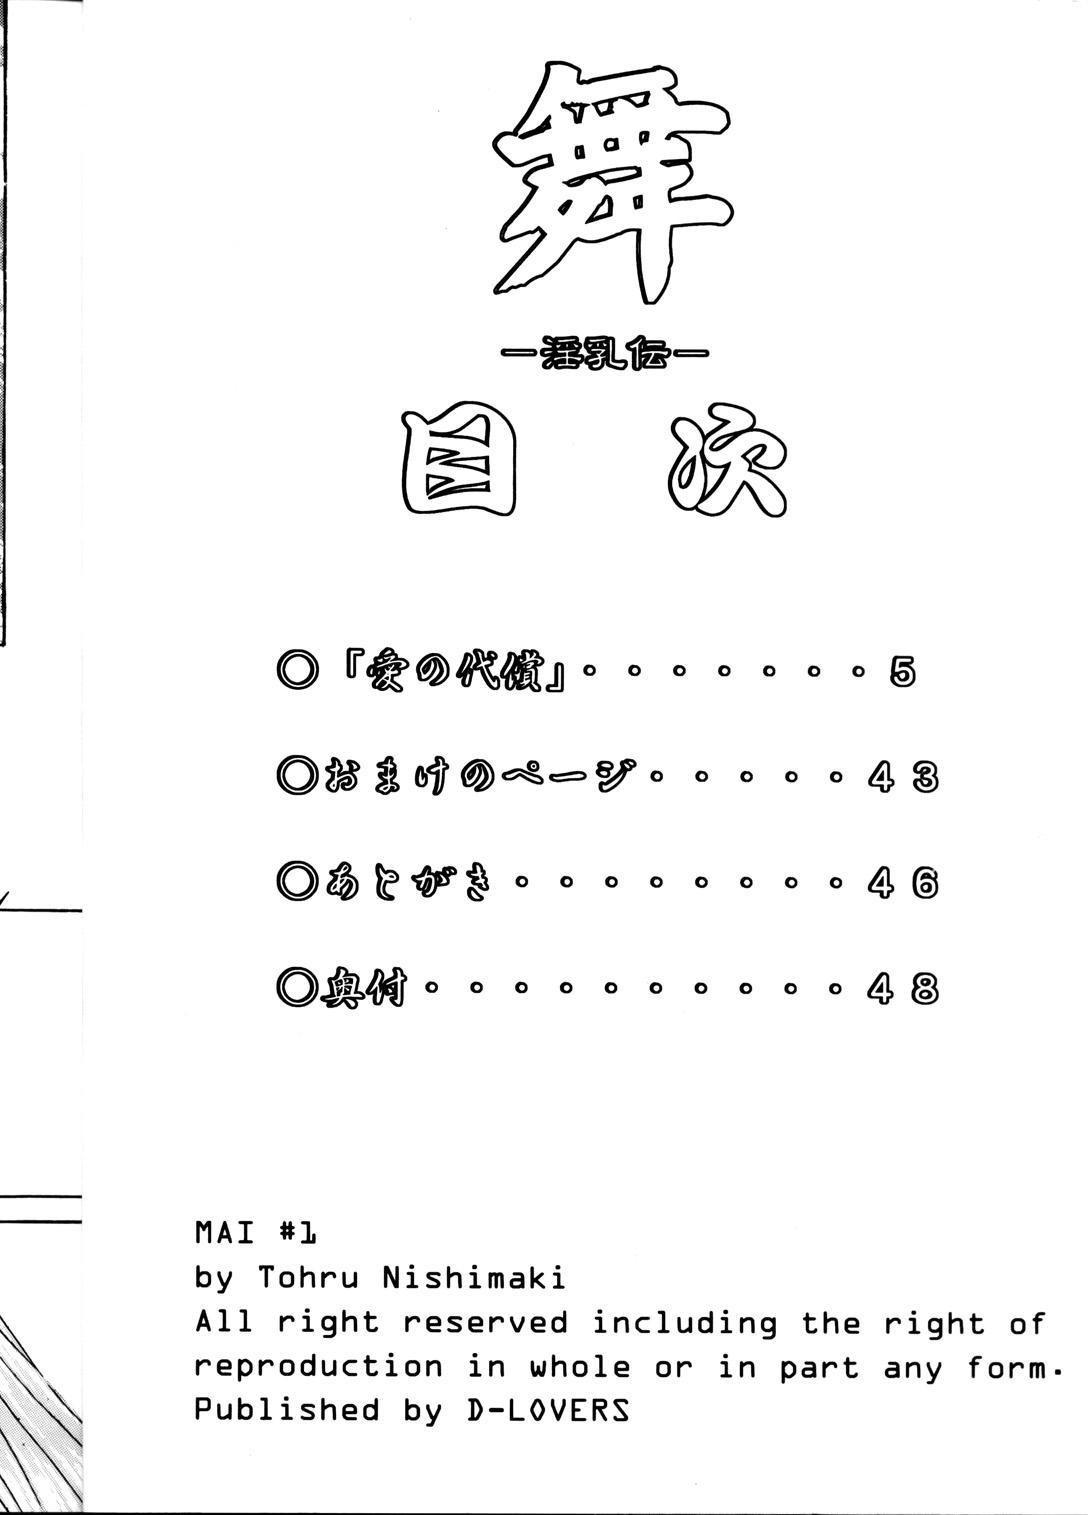 (C60) [D-LOVERS (Nishimaki Tohru)] Mai -Innyuuden- Daiichigou (King of Fighters) 2